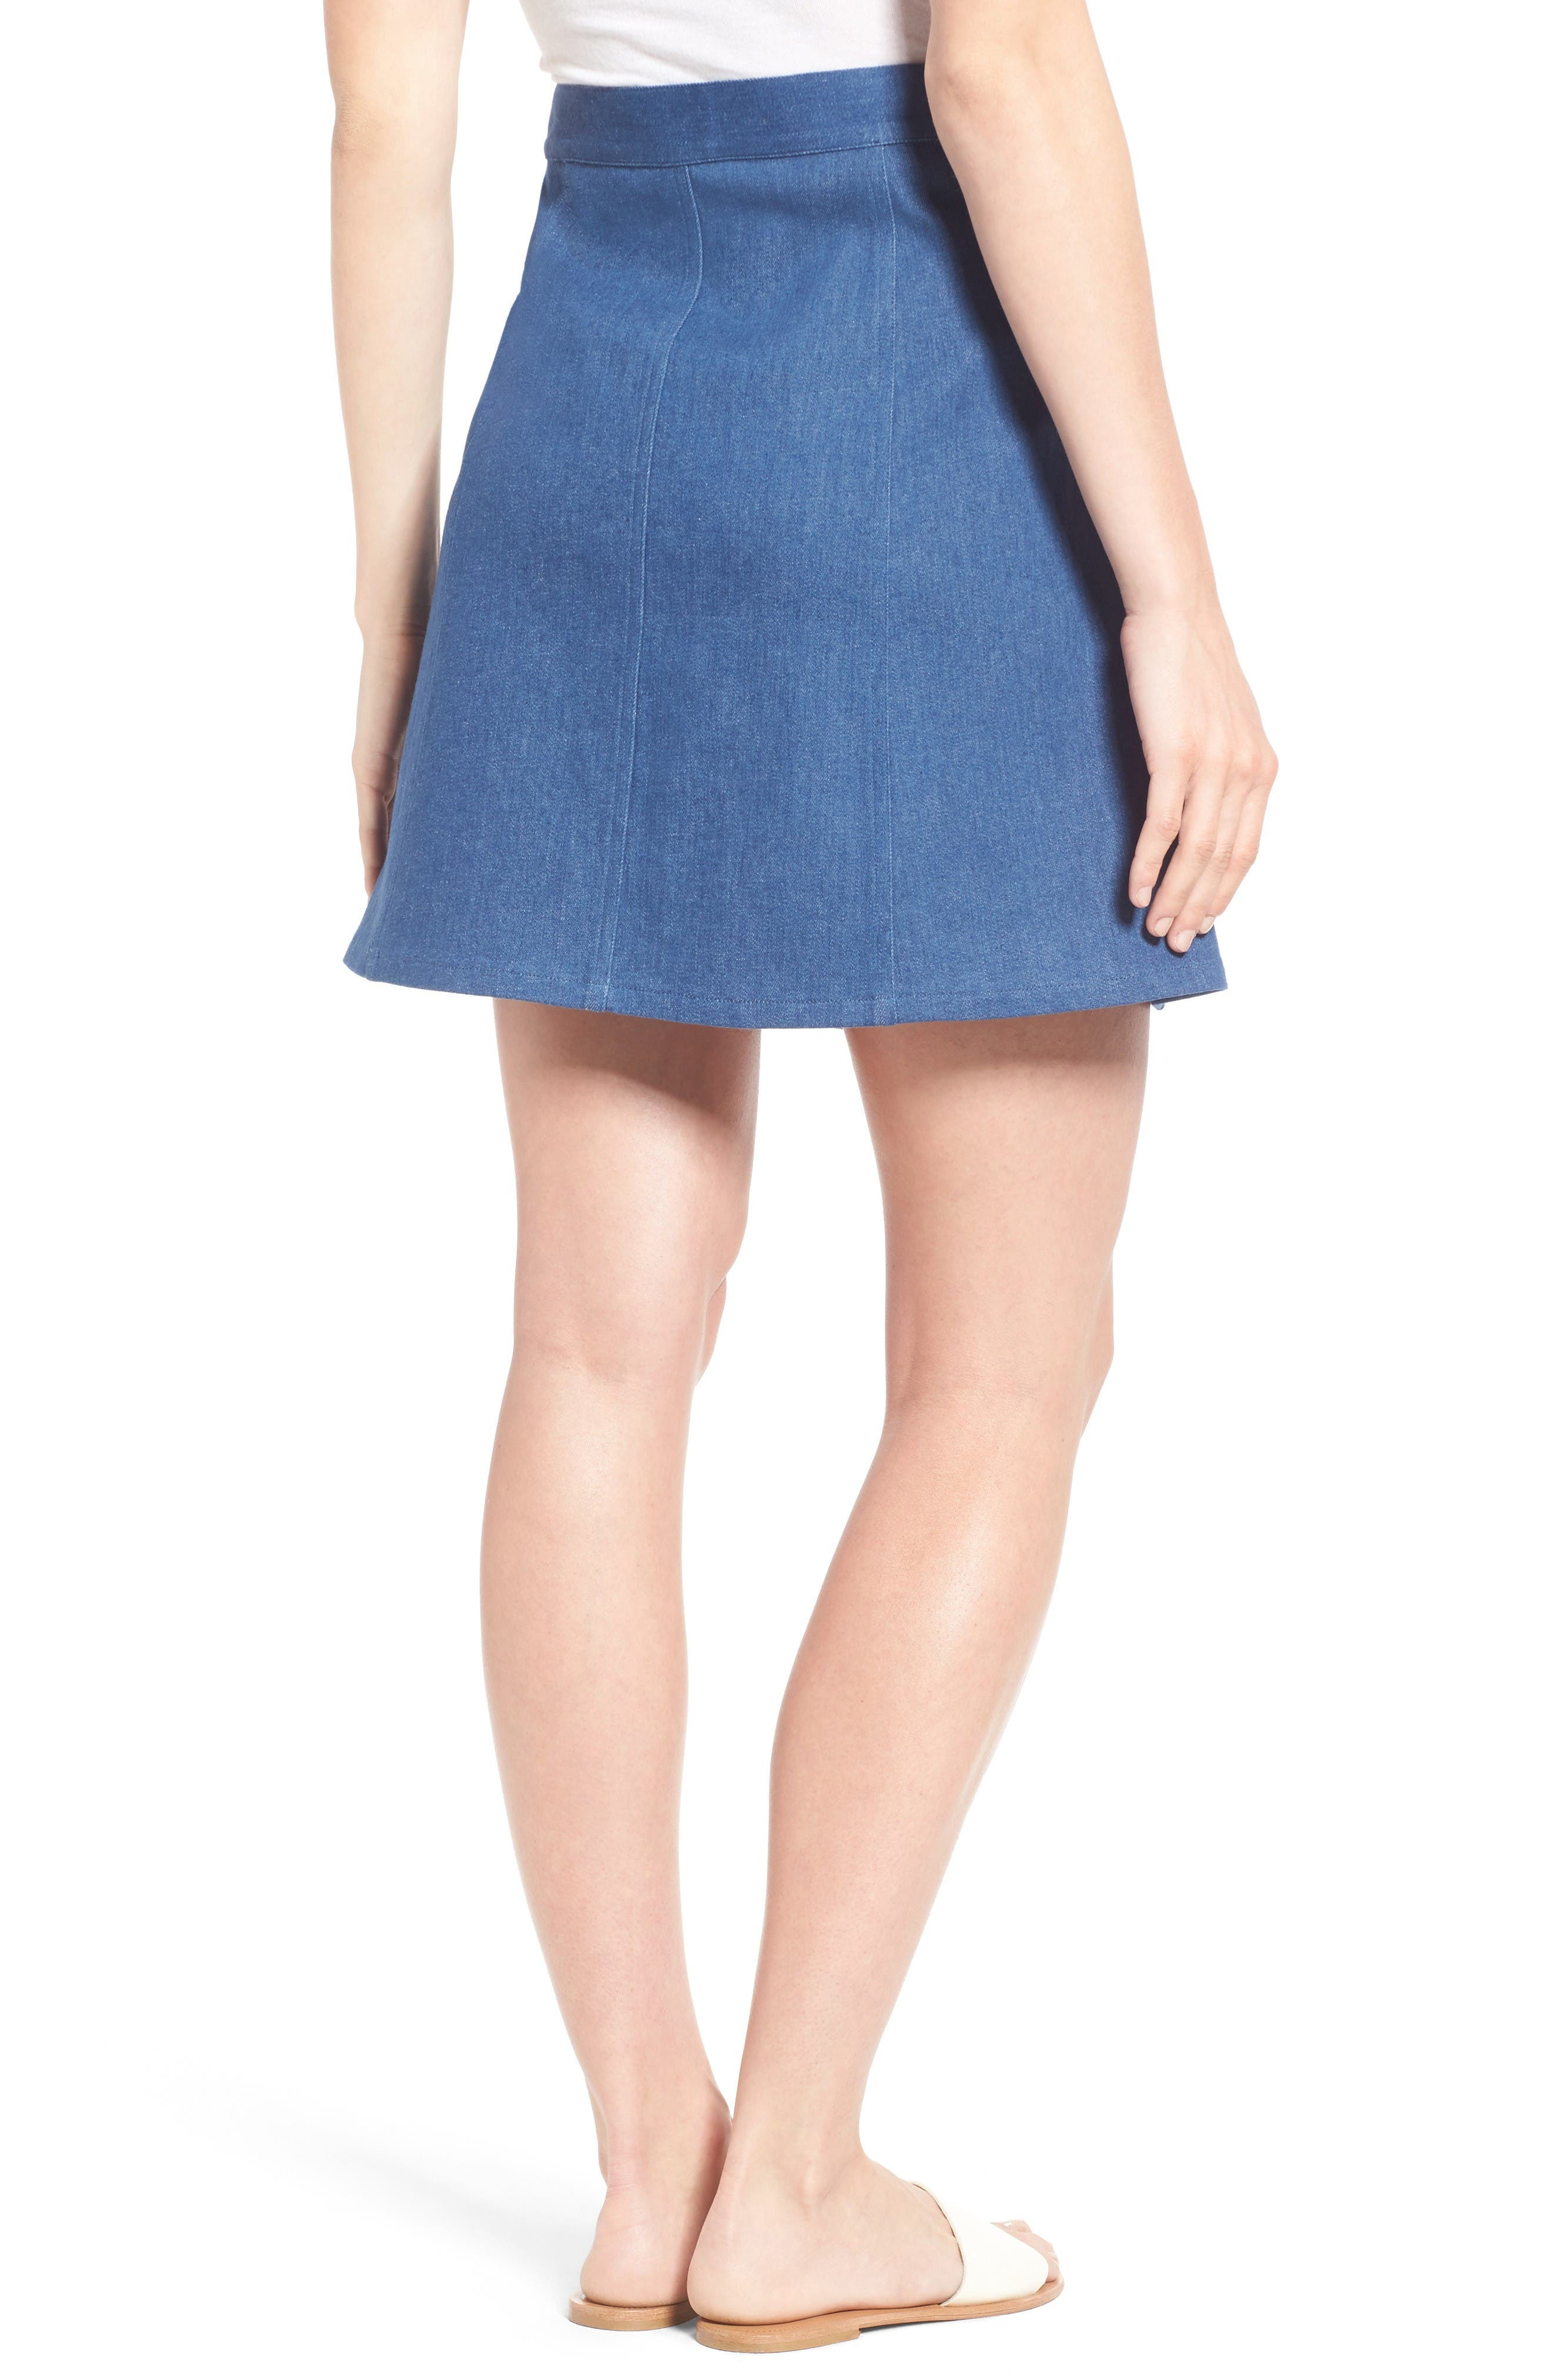 Alternate Image 2  - Draper James Stretch Denim Miniskirt (Nordstrom Exclusive)